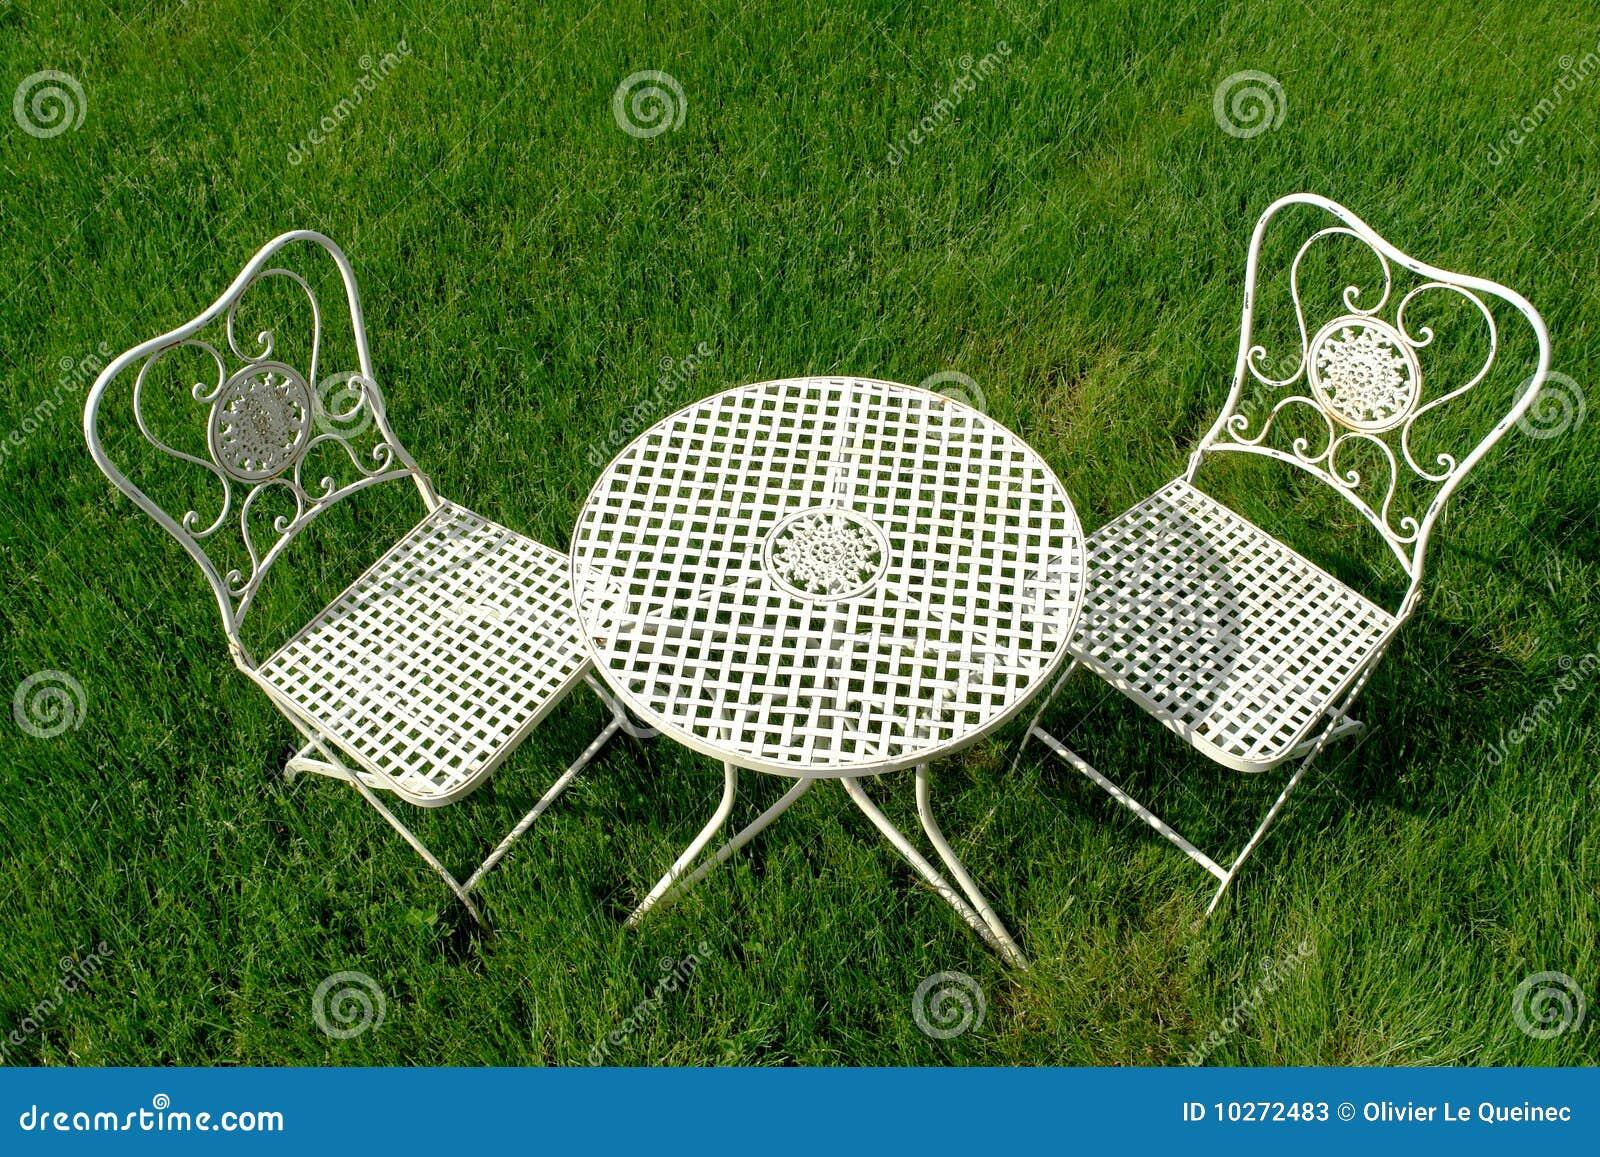 Groovy Cast Iron Patio Furniture Set On Green Grass Stock Image Download Free Architecture Designs Xaembritishbridgeorg